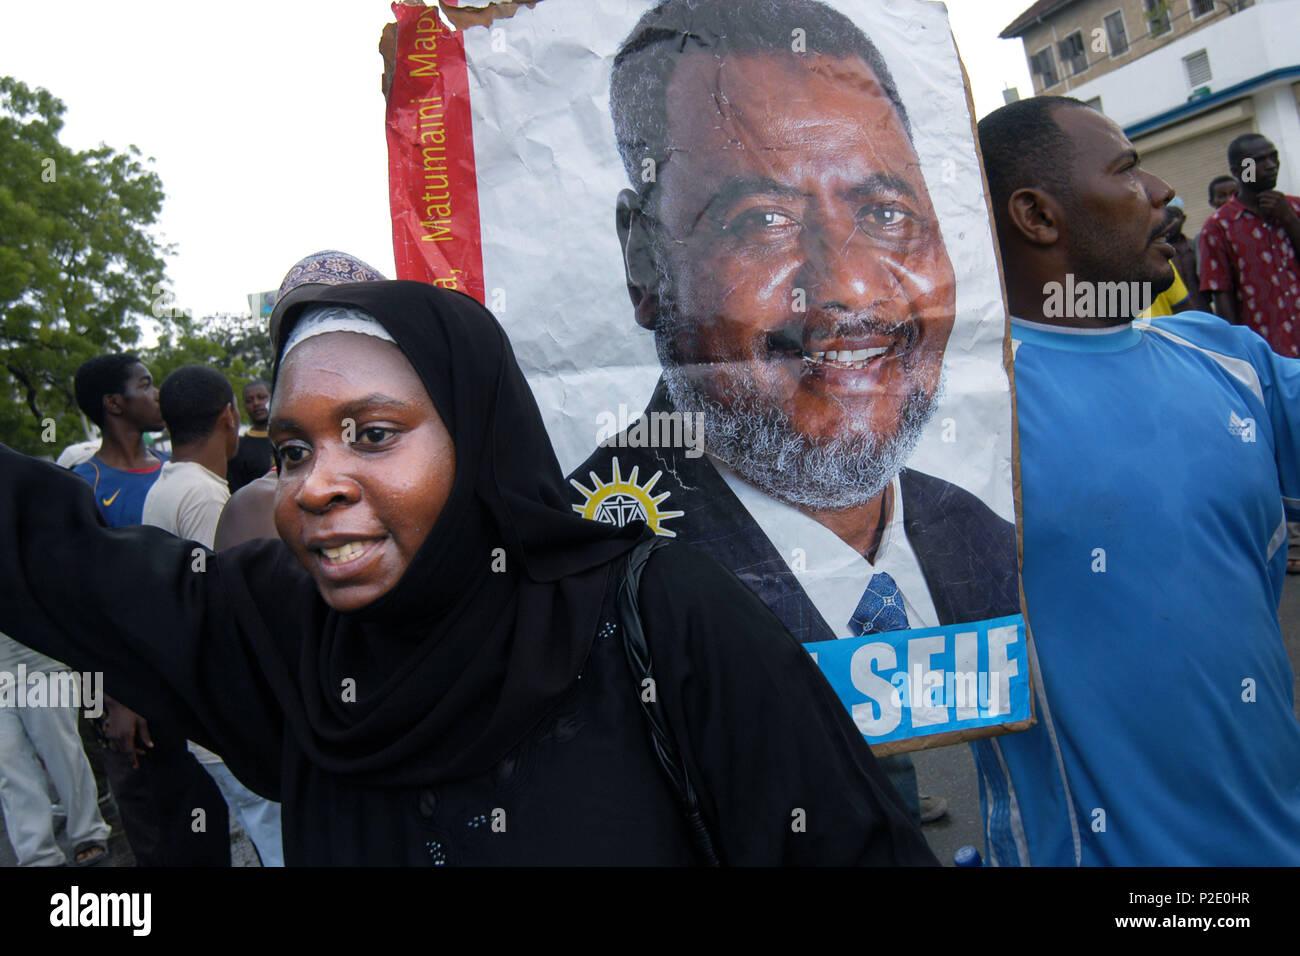 Demonstrations during elections in Stonetown, Zanzibar, Tanzania